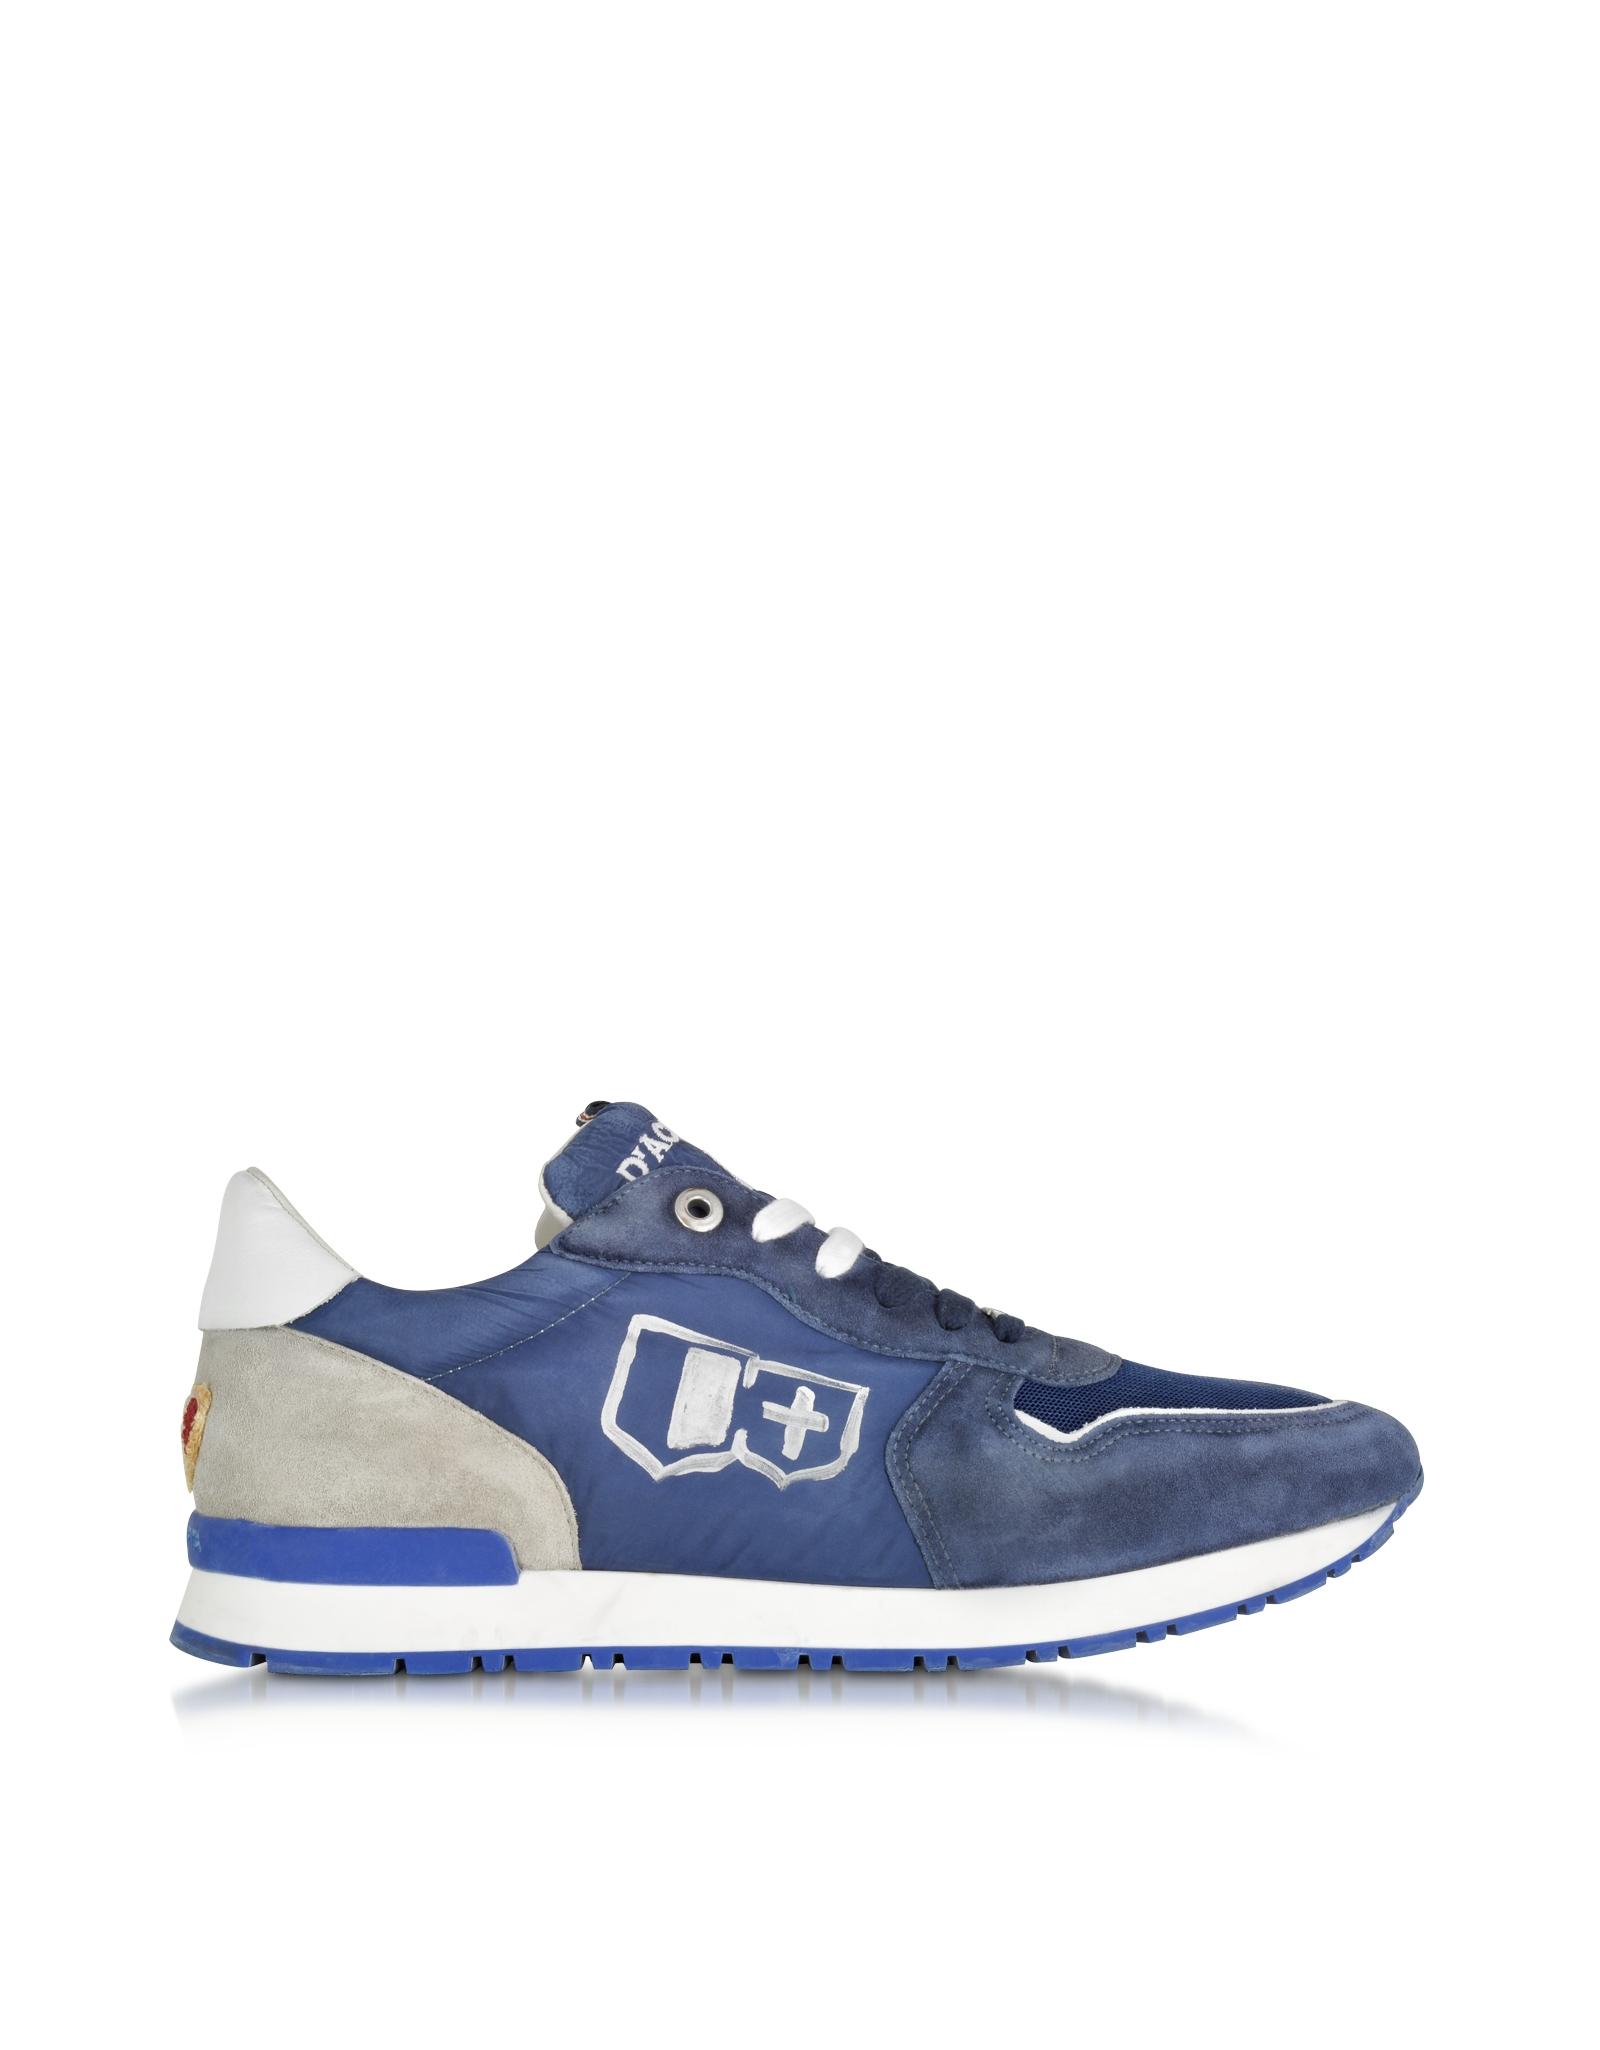 Botticelli Shoes New York